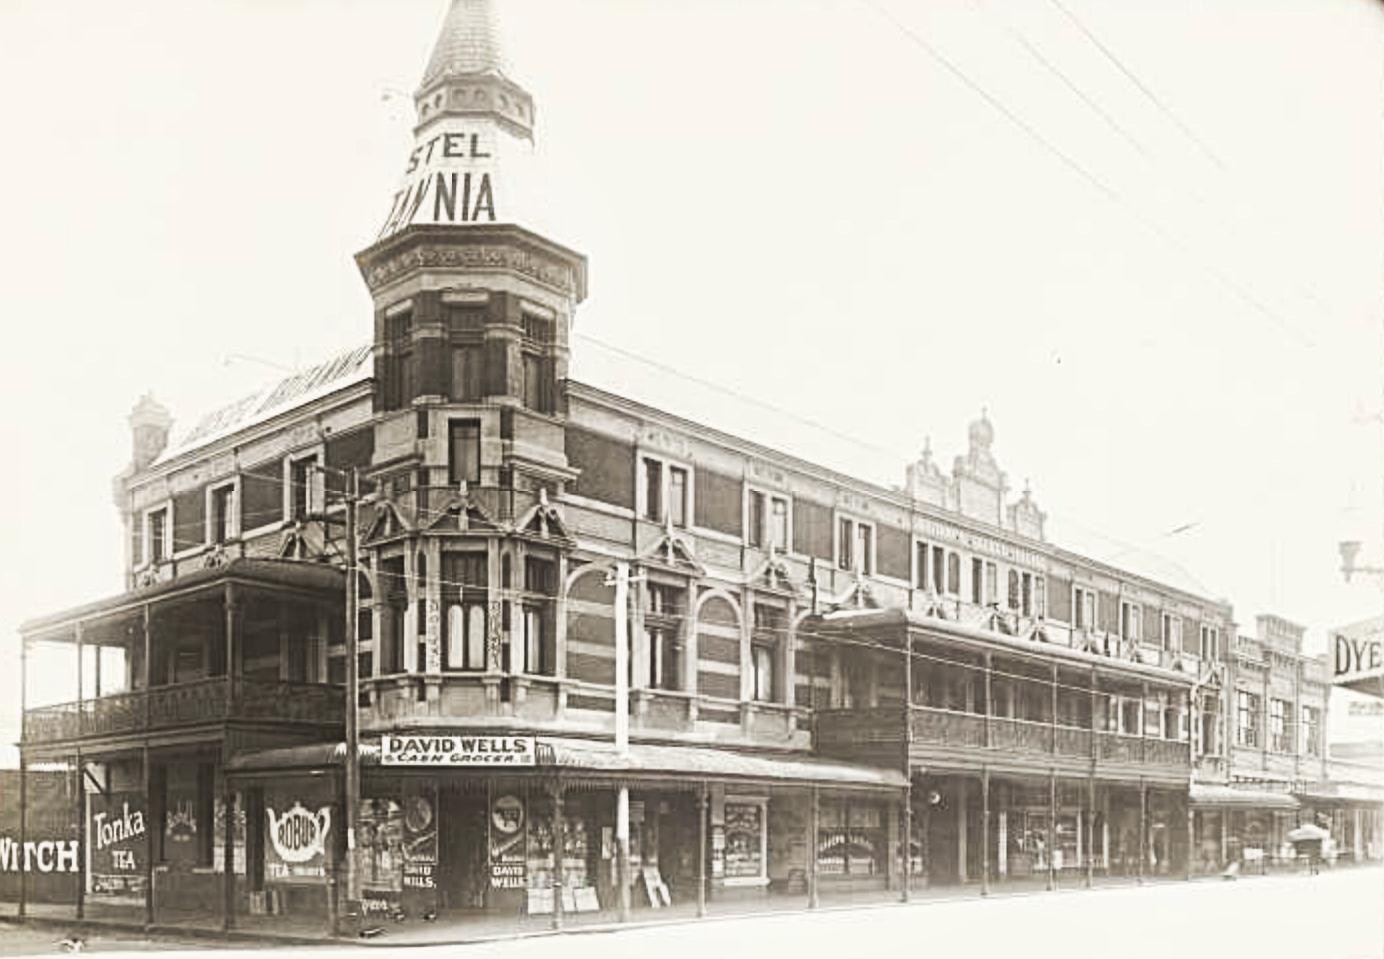 The Britannia Building, c1930, courtesy State Library of Western Australia, image b2101548_4.